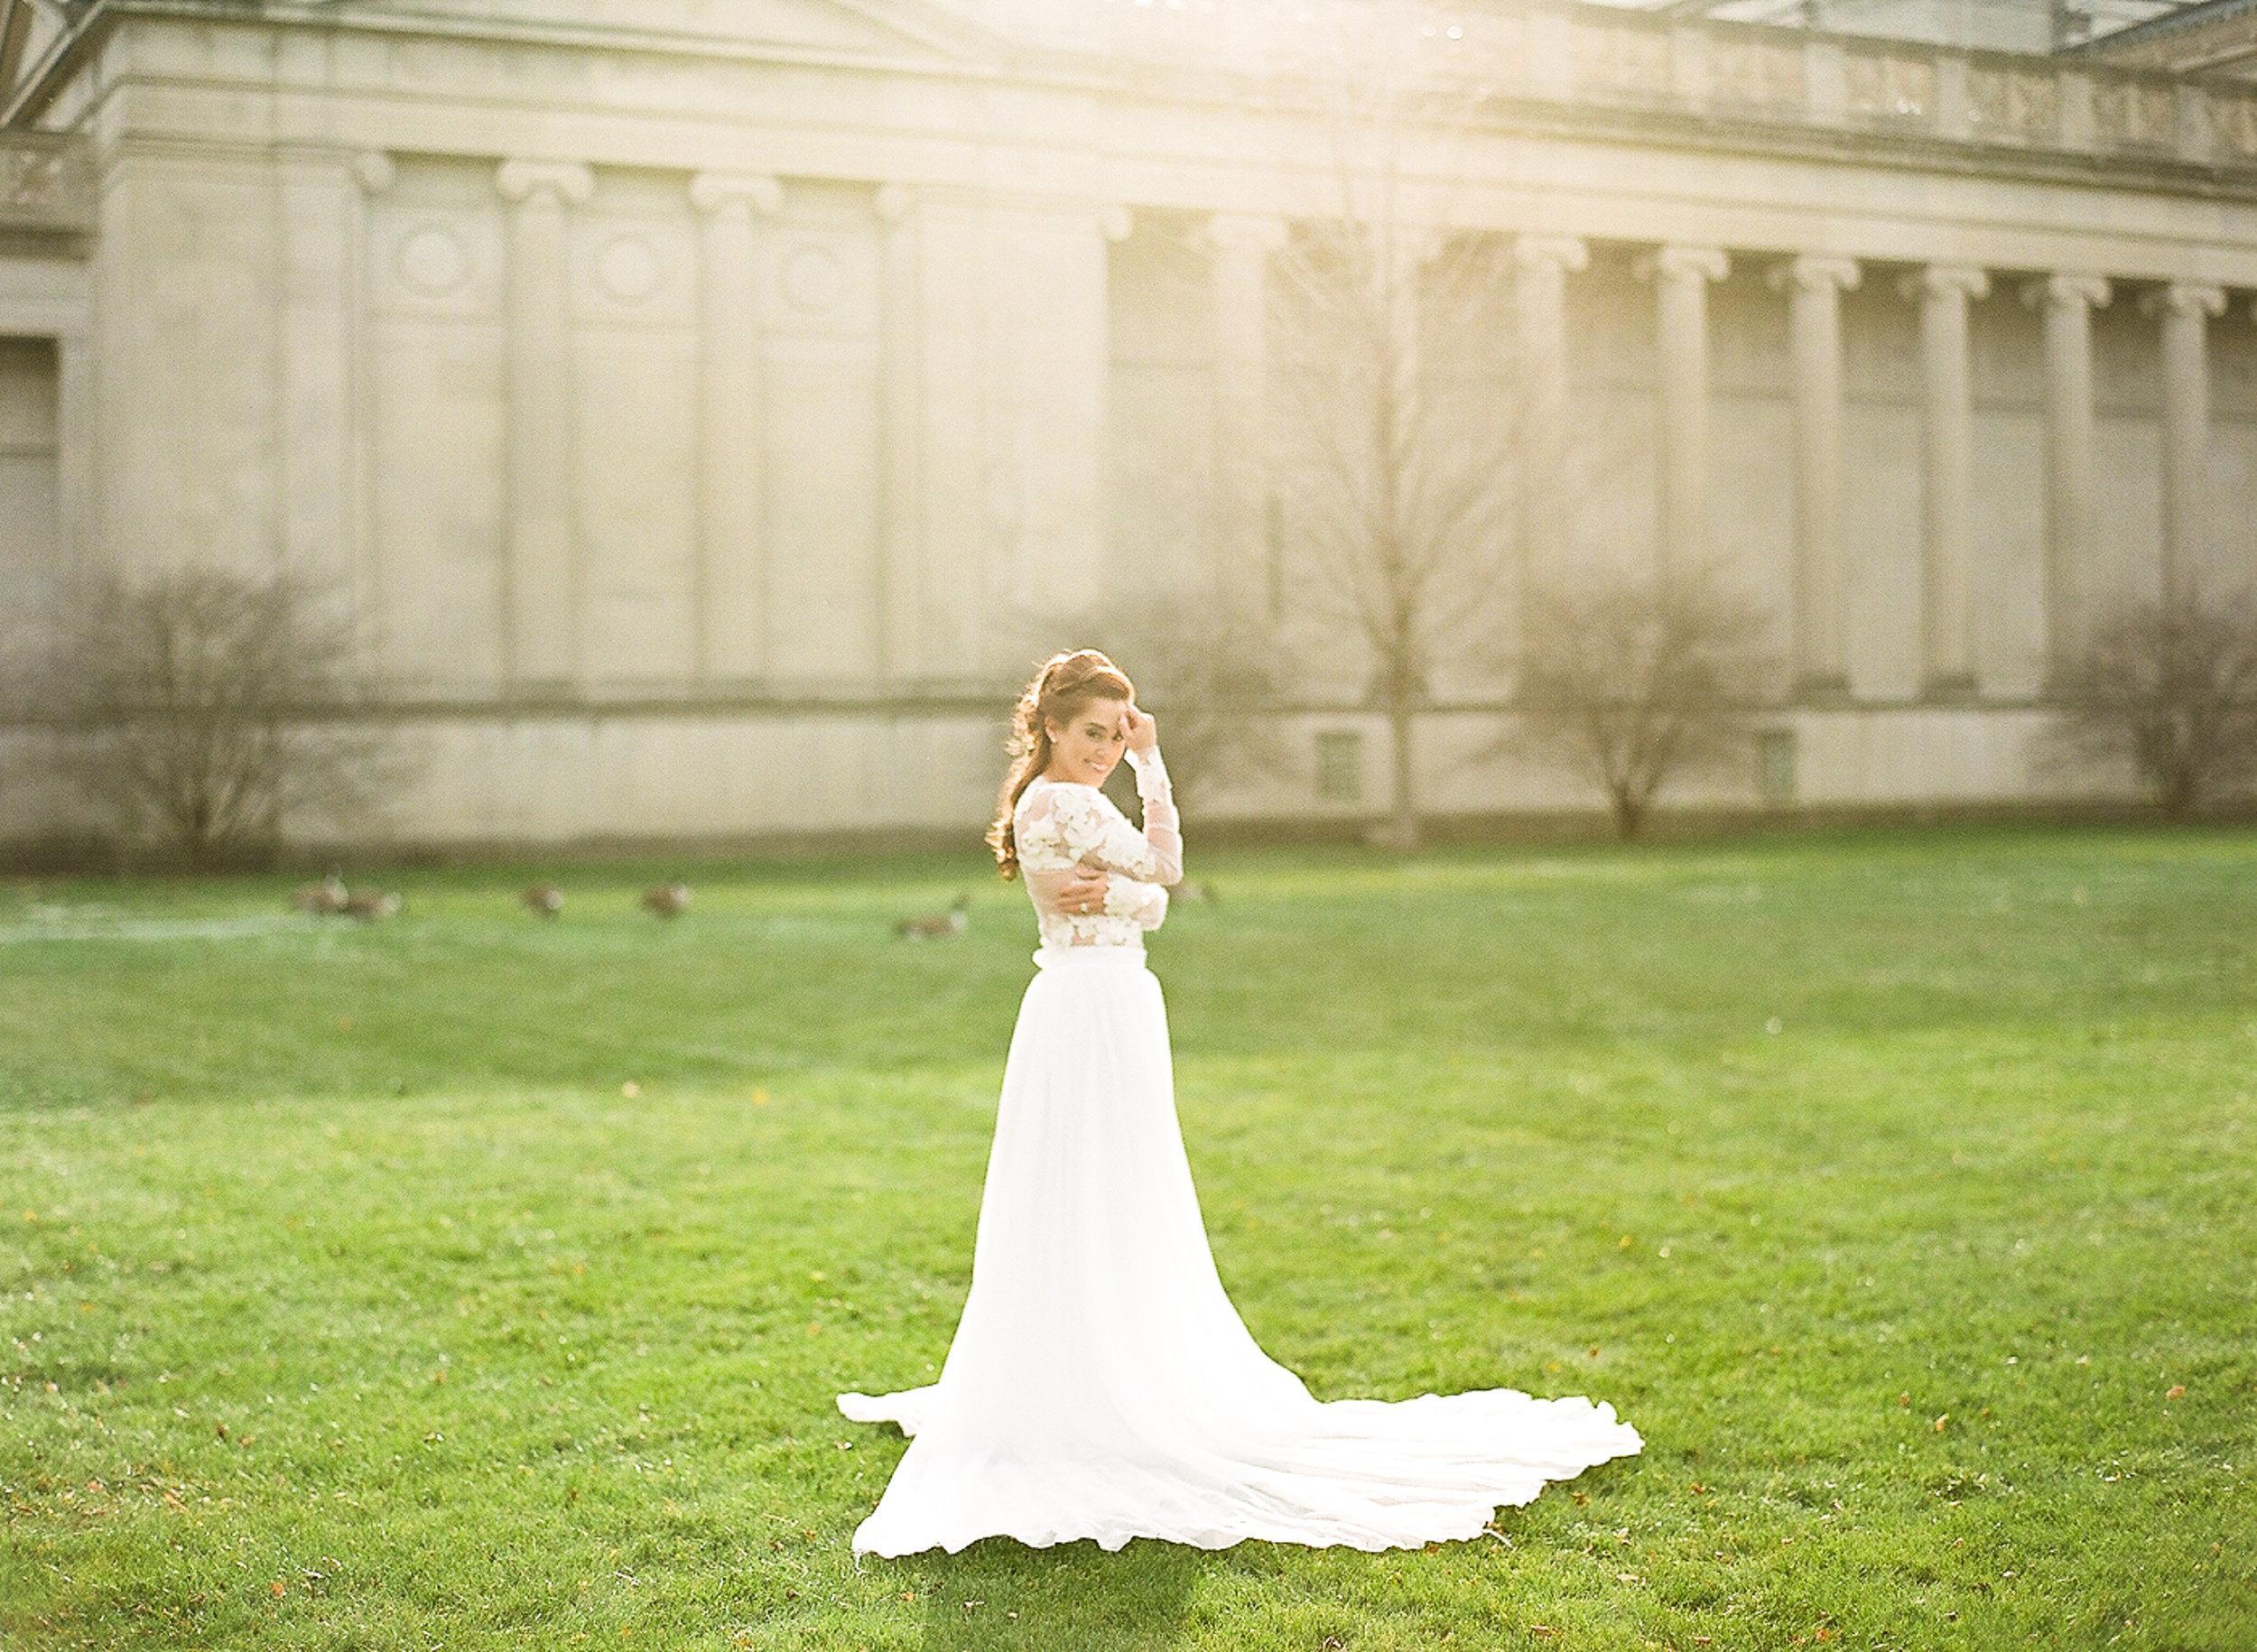 Bonphotage Fine Art Wedding Photography